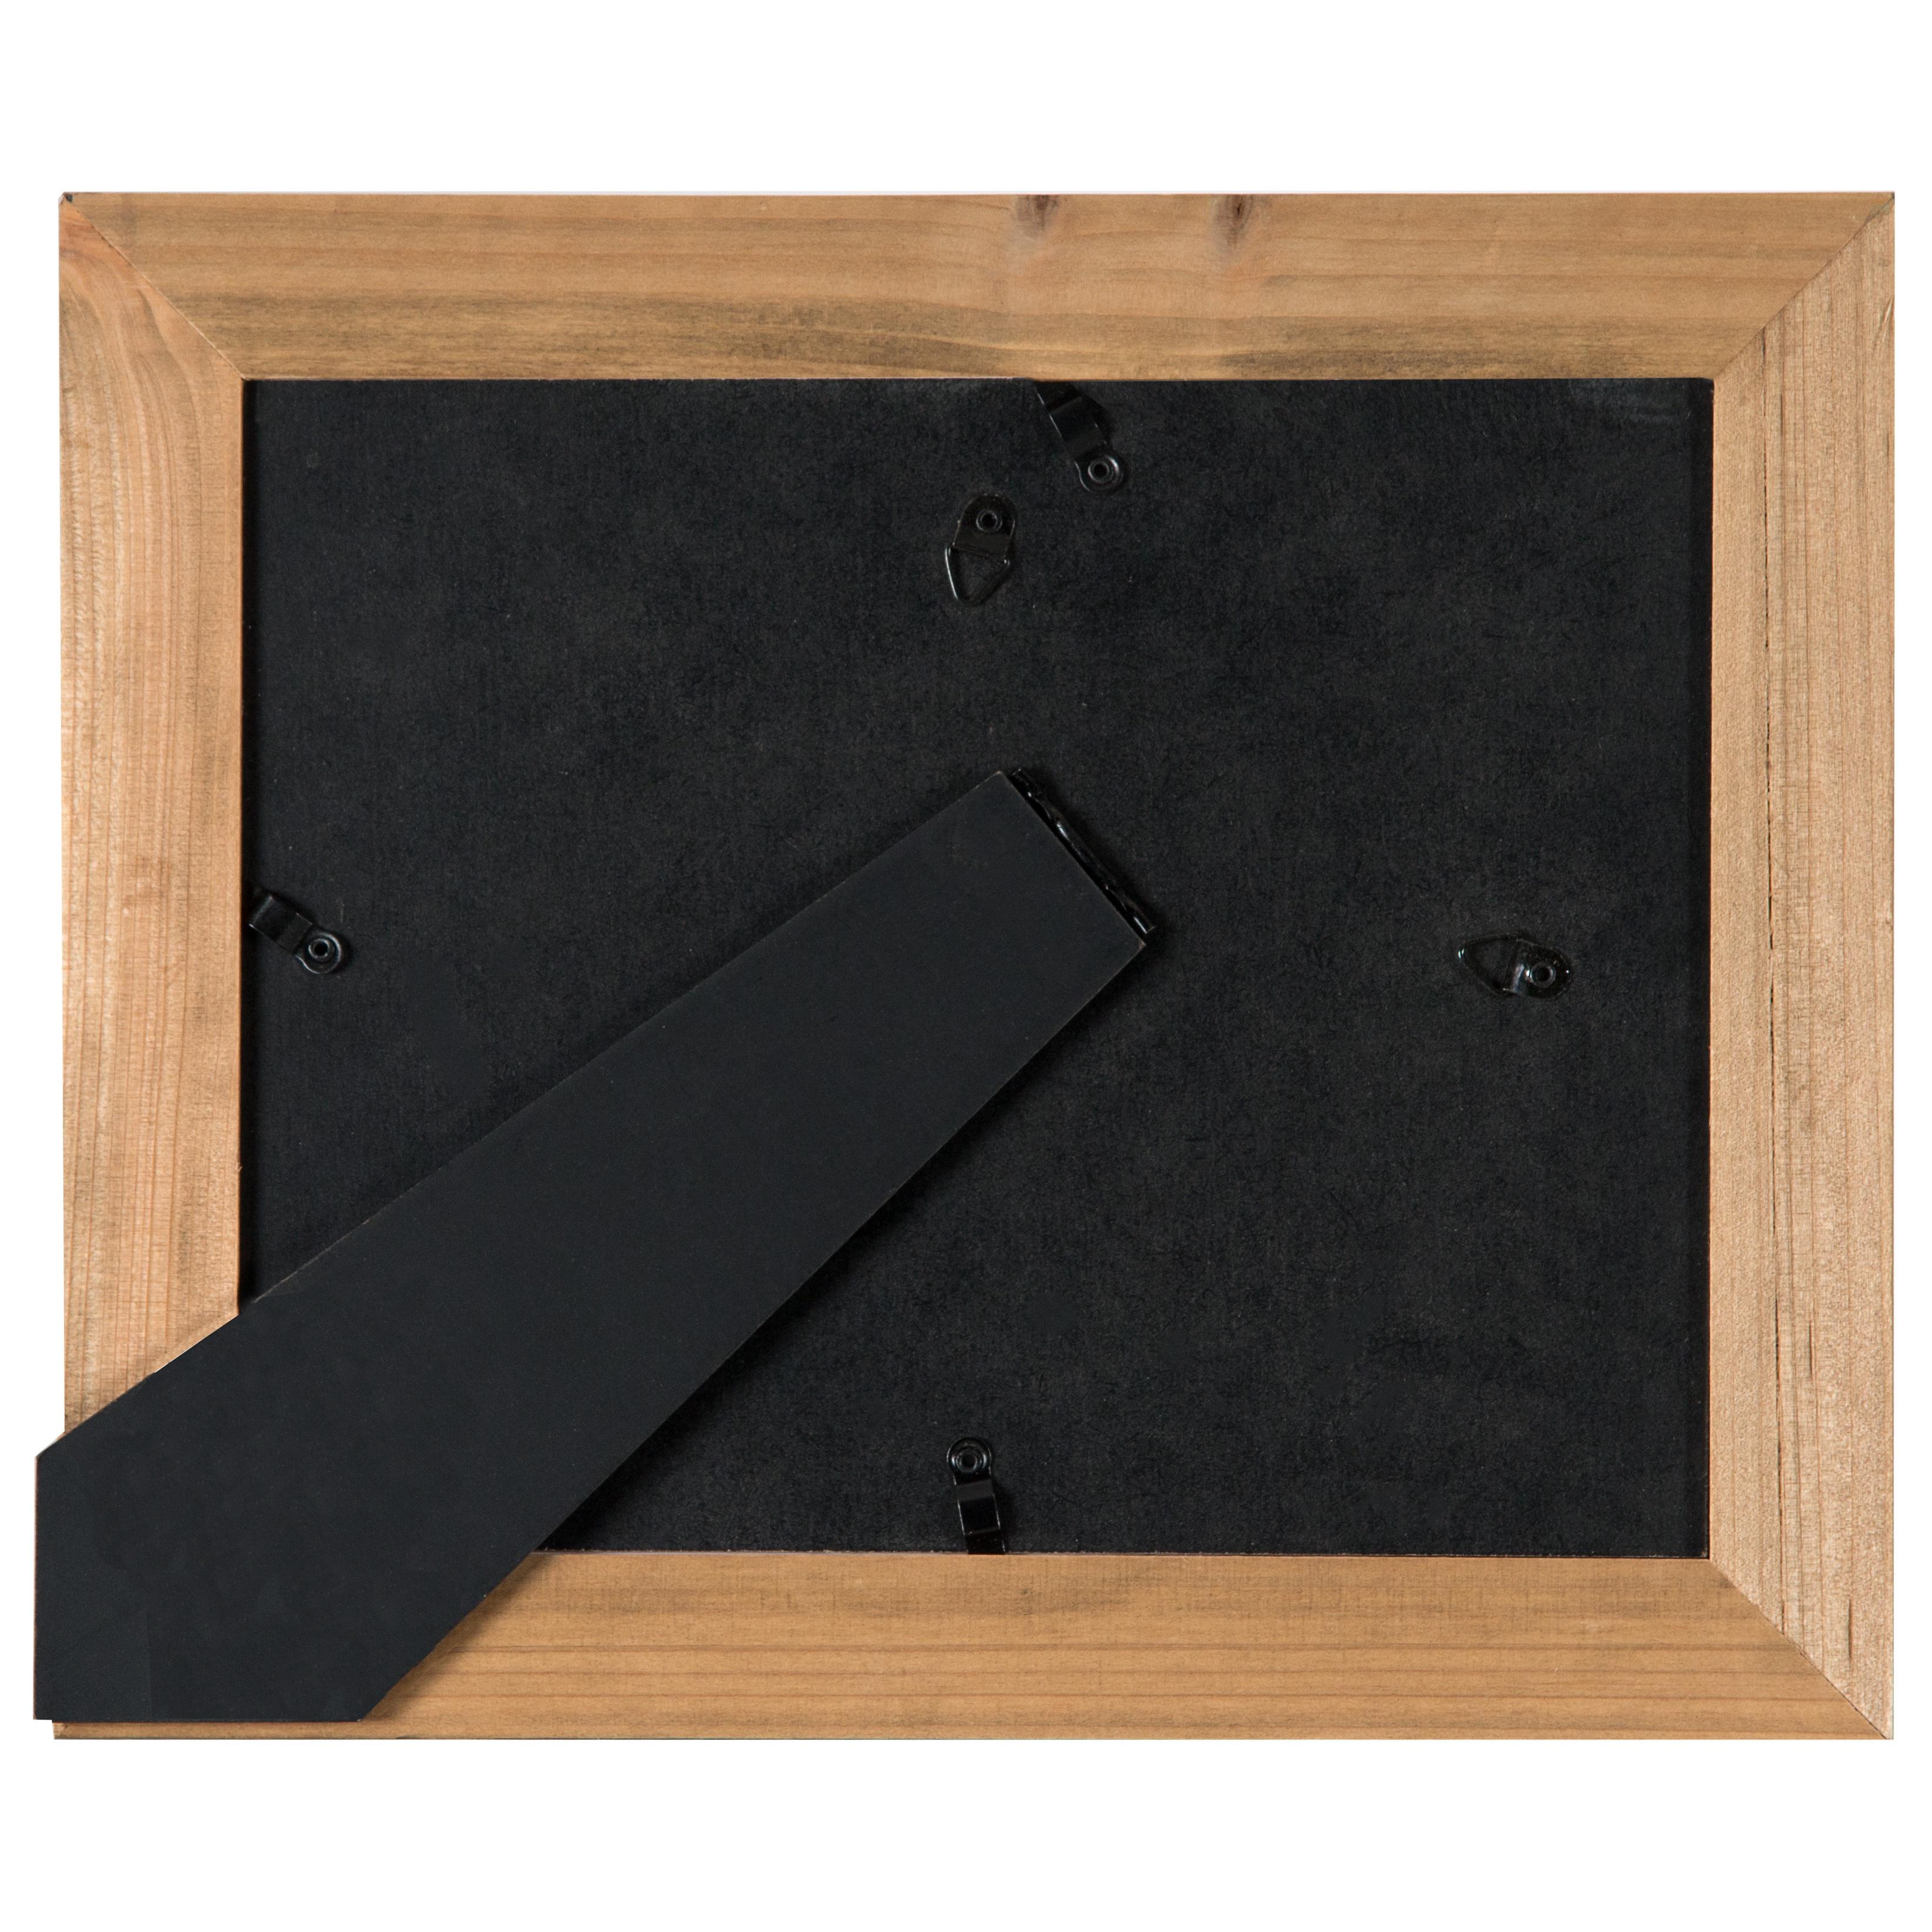 Rustic Picture Frames 11×14 | Sevenstonesinc.com